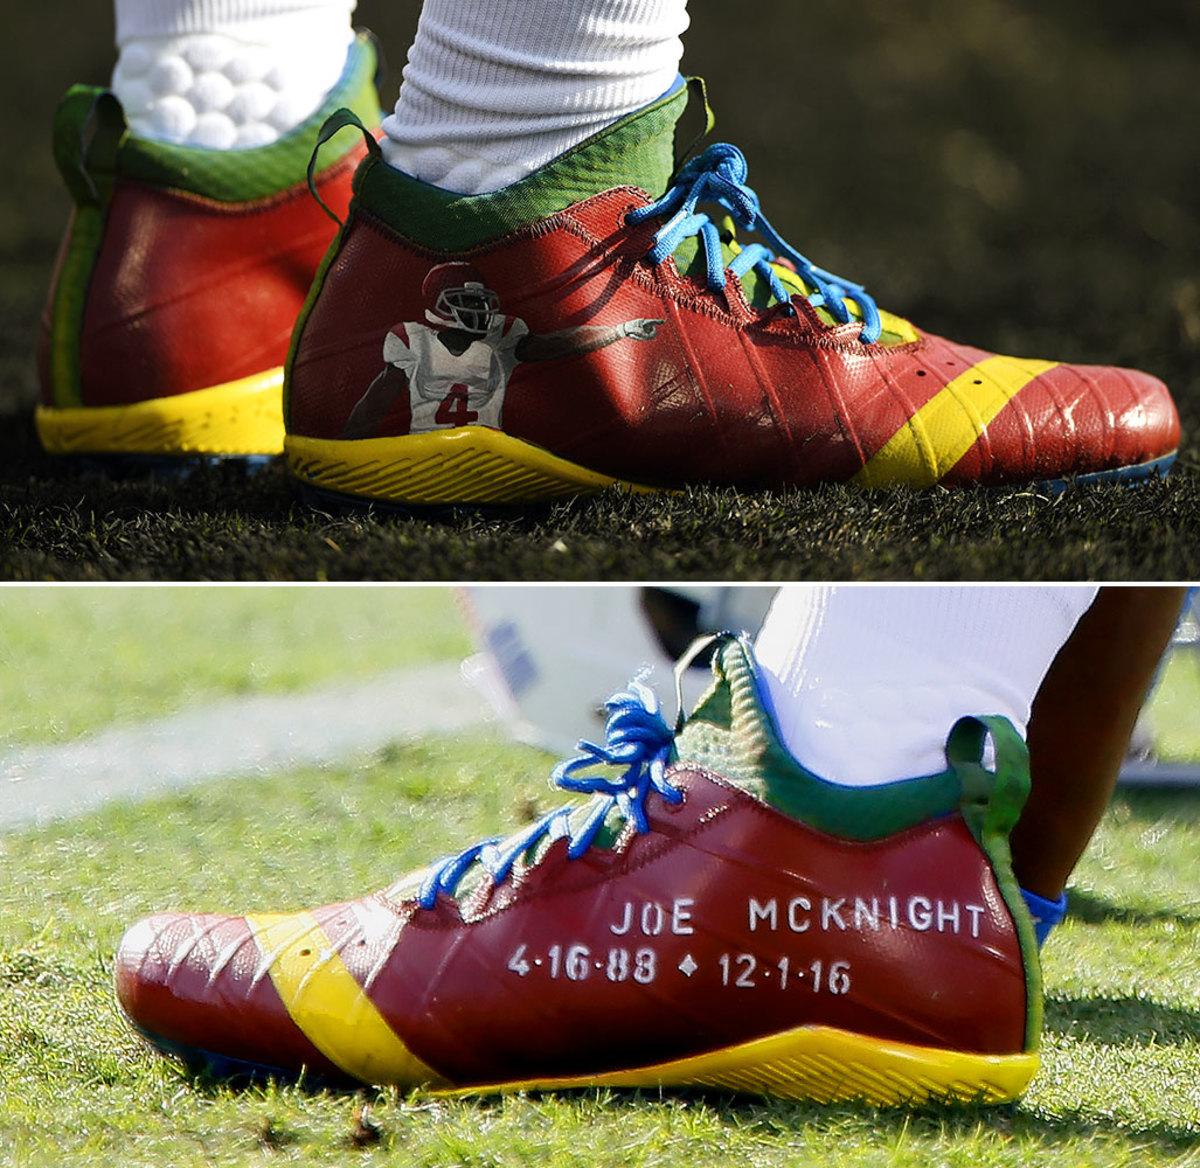 2016-1204-Reggie-Bush-Joe-McKnight-tribute-cleats.jpg